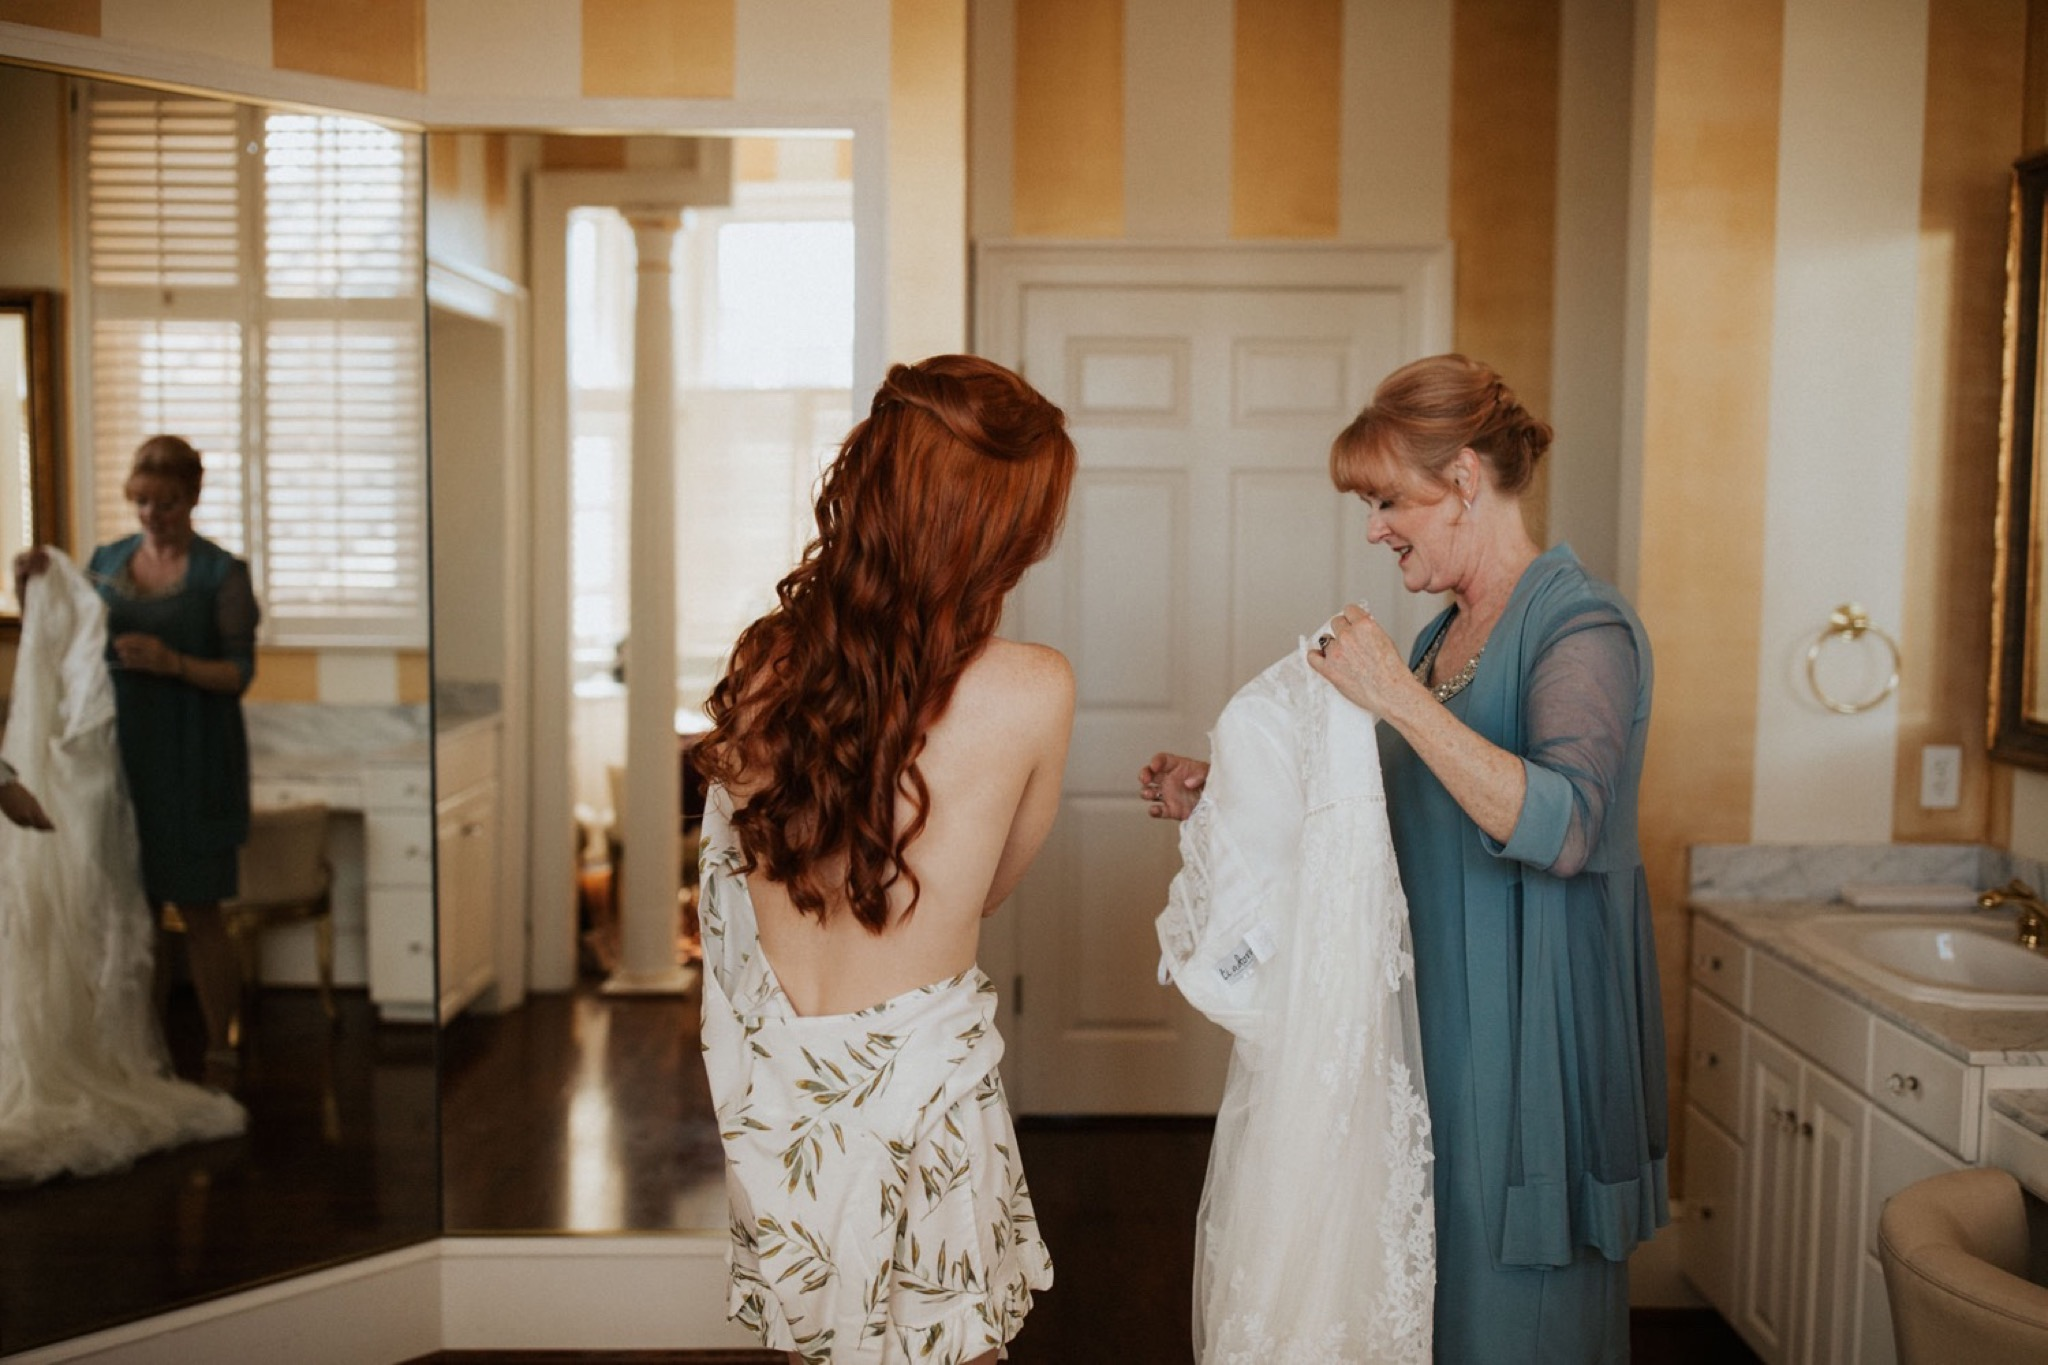 25_West Manor Estate Weddings - Pat Cori Photography-48_bride_VirginiaWeddingPhotographer_gettingready_WestManorEstate_Portraits_Wedding.jpg